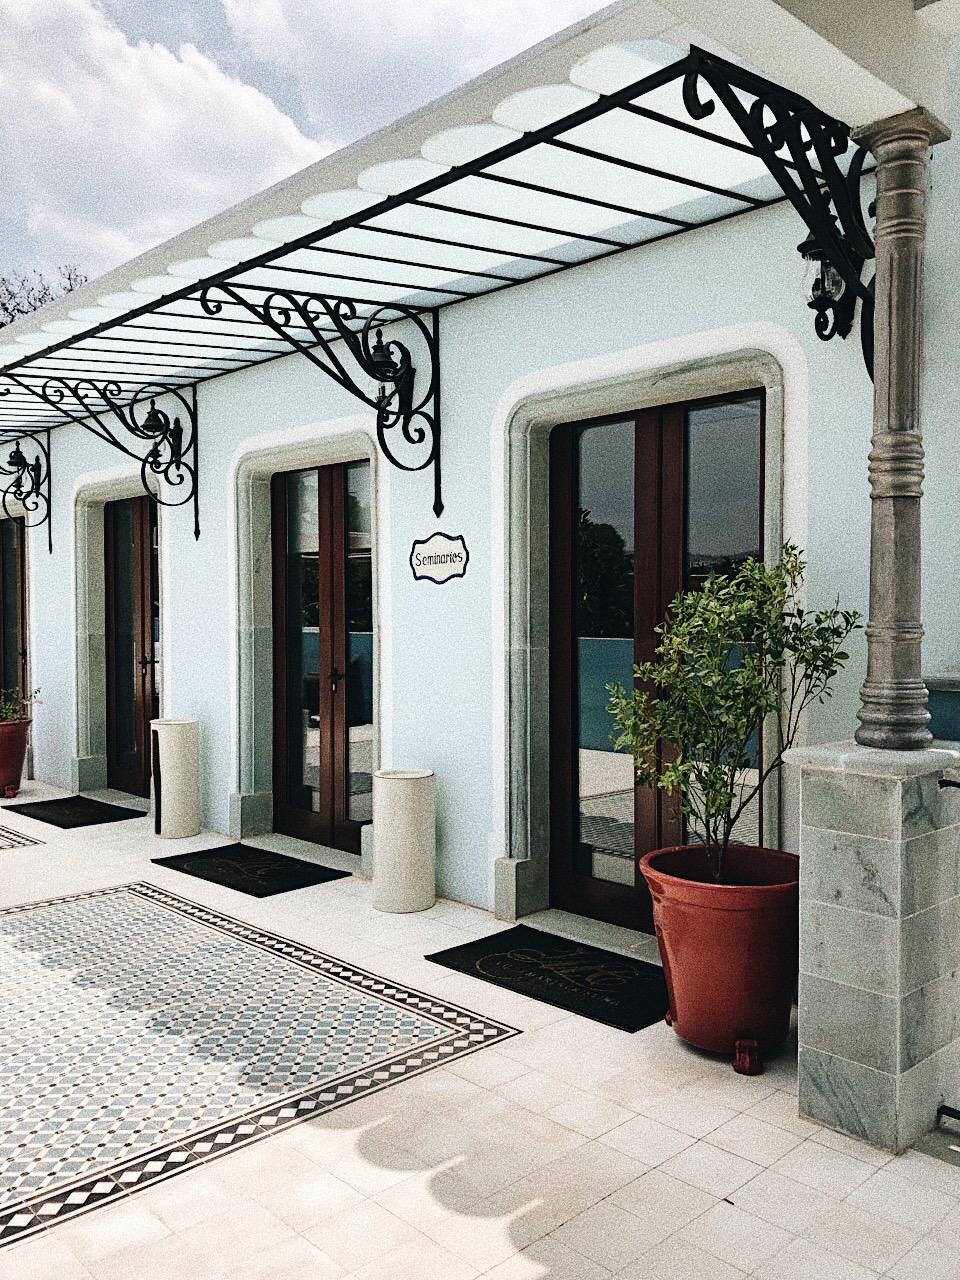 Hotel Villa María Cristina bodas Guanajuato